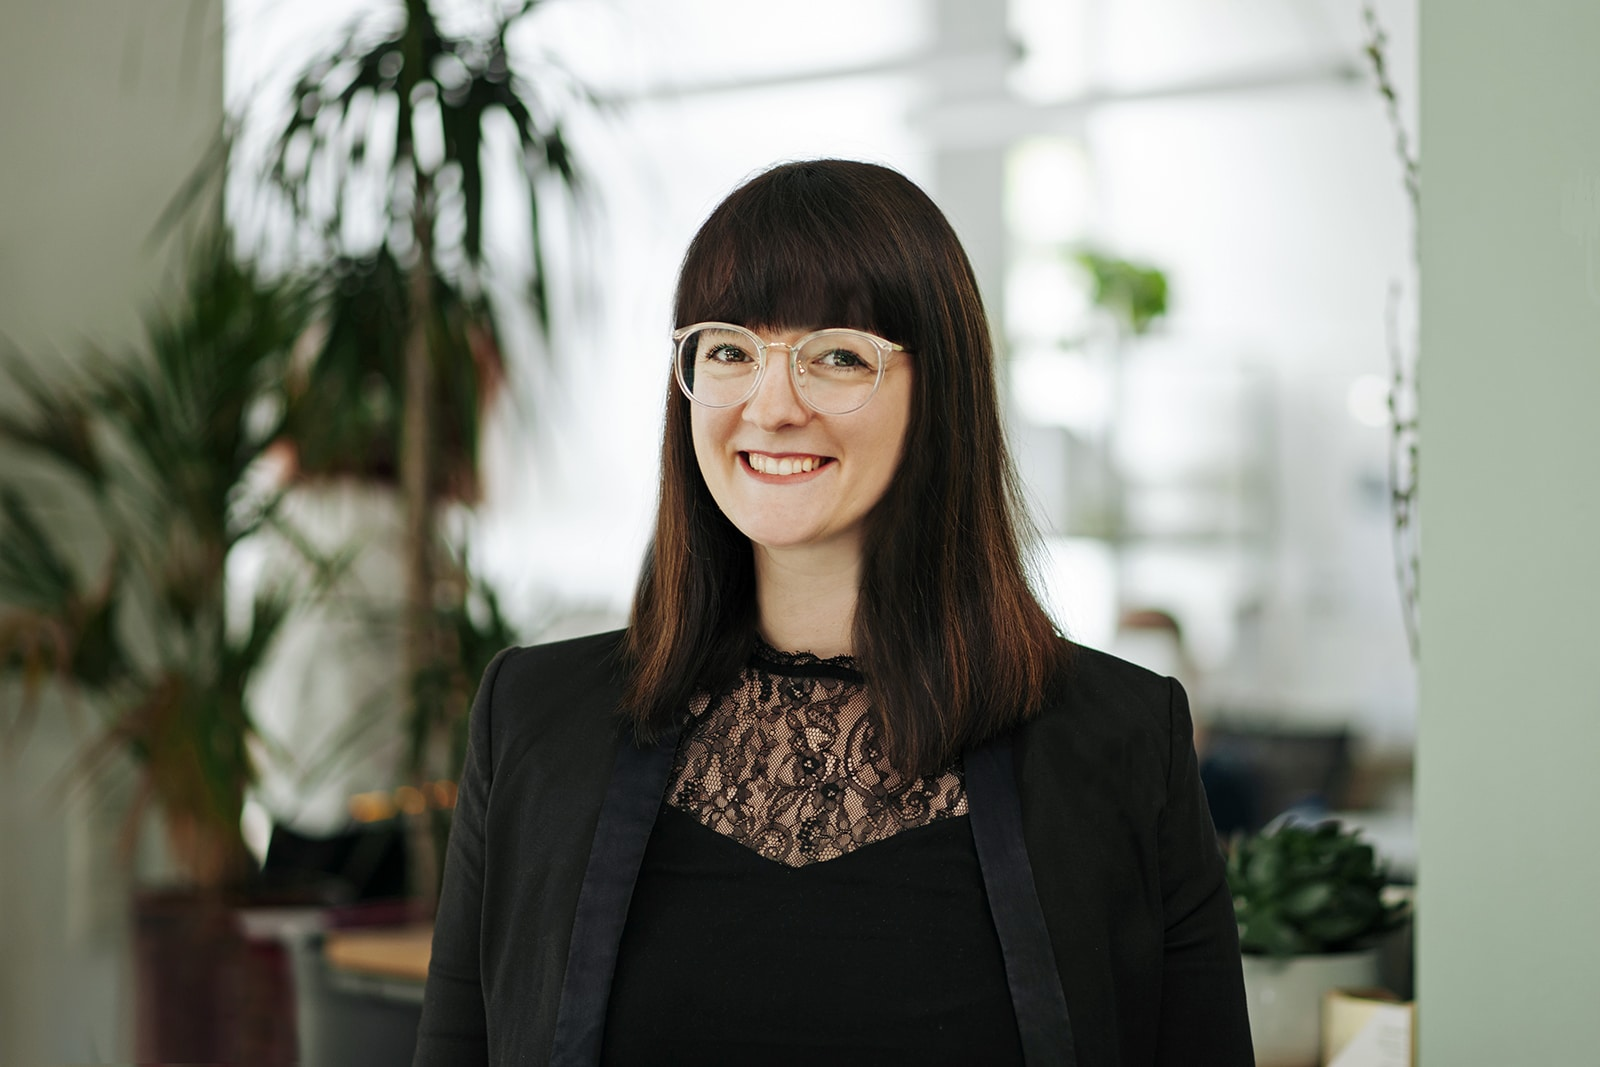 Angelika Löffler